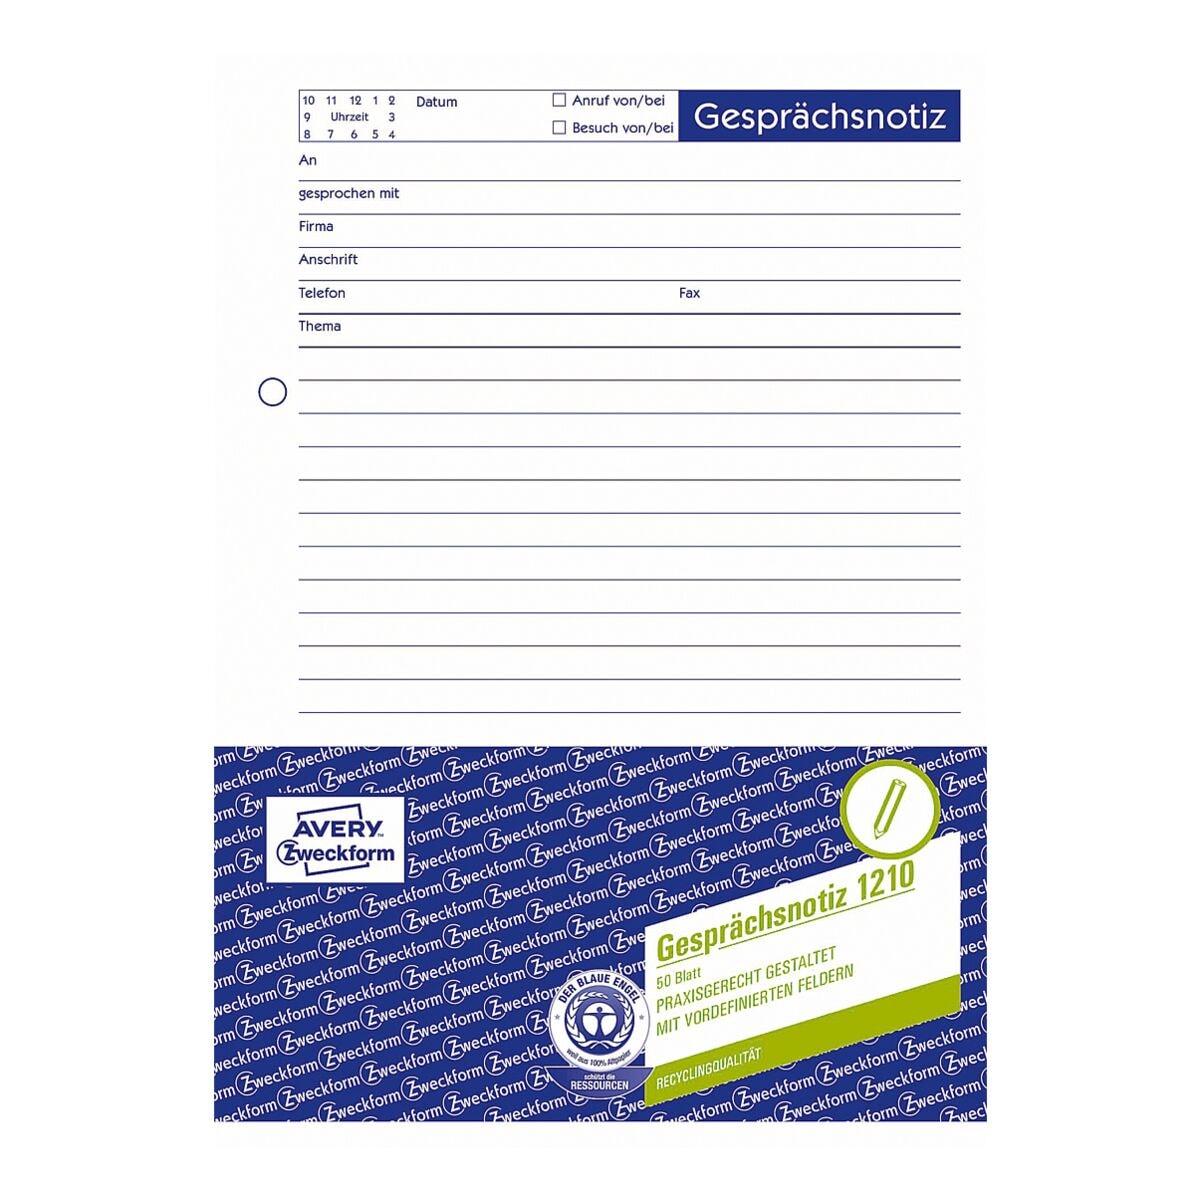 Avery Zweckform Formularvordrucke »Gesprächsnotiz« (Recyclingpapier)